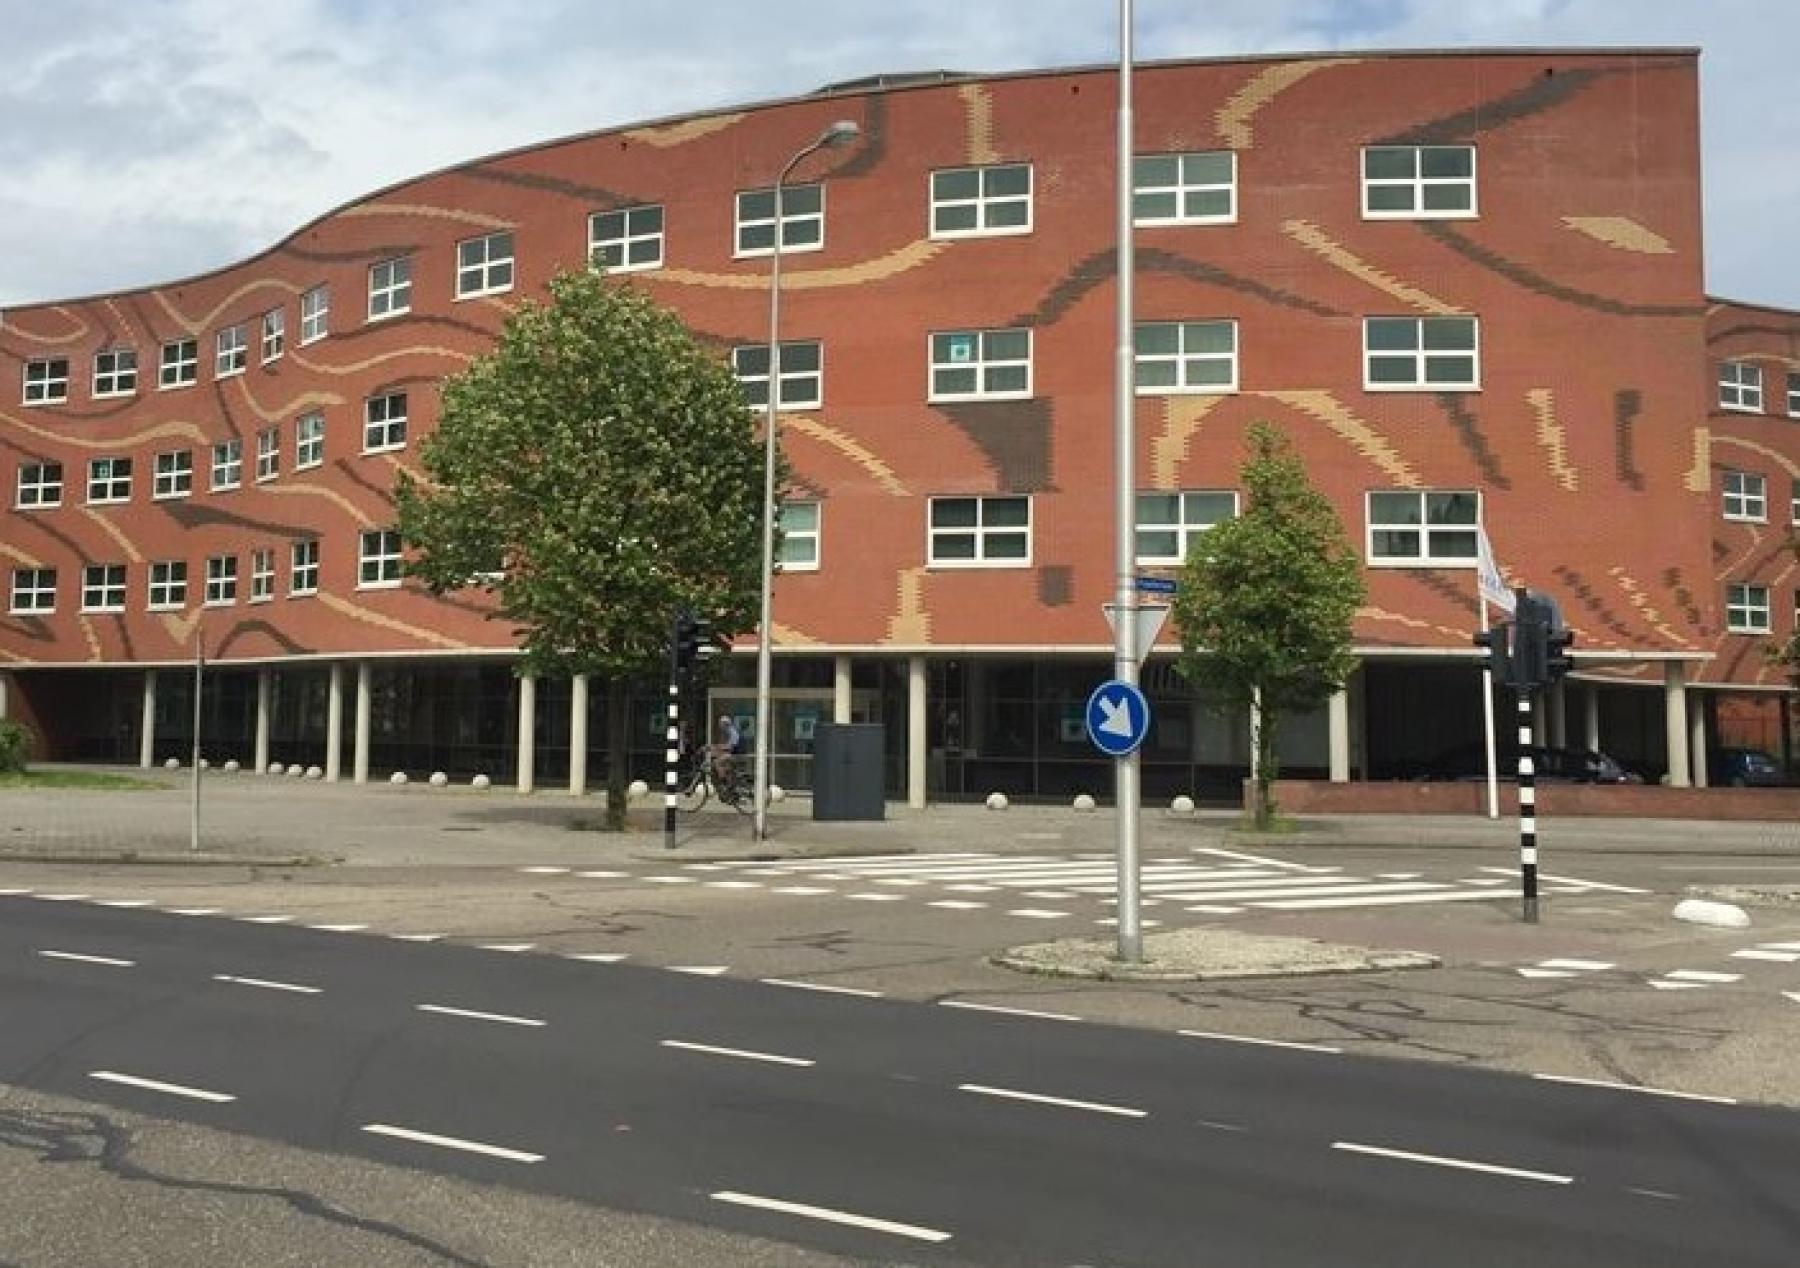 kantoorpand kantoorgebouw ramen Roermond Kapellerpoort